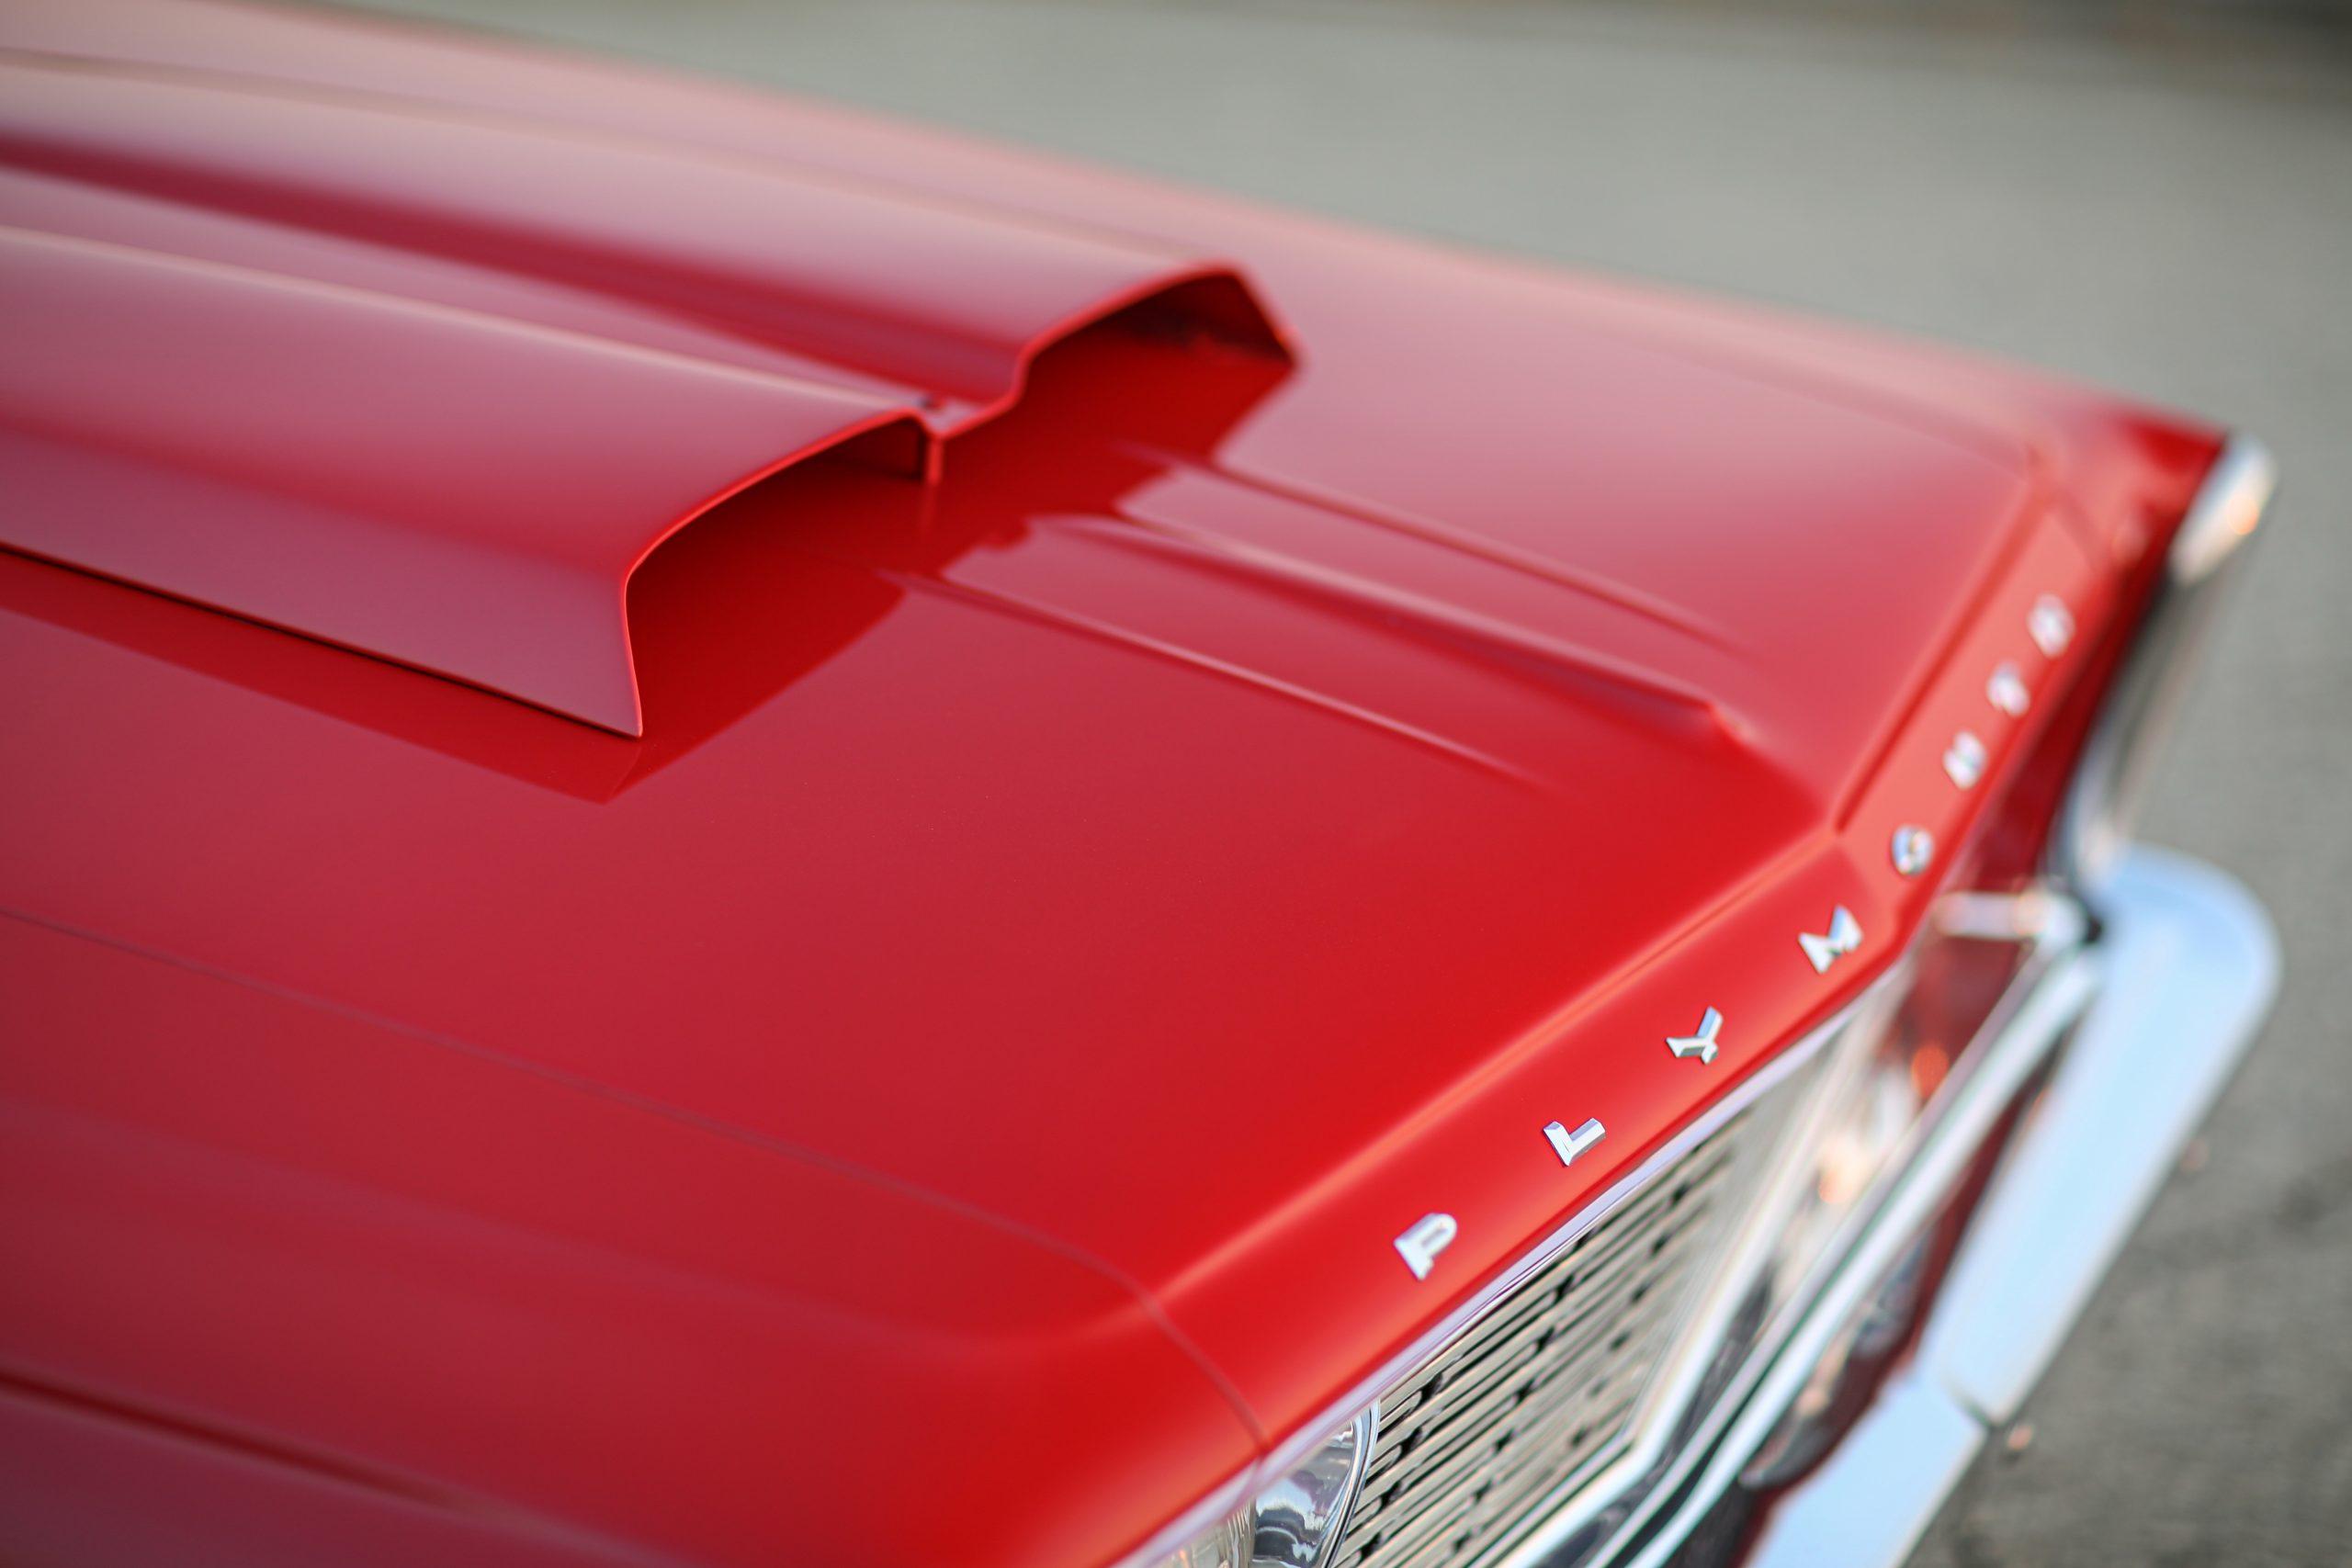 1963 Plymouth 426 Max Wedge lightweight hood scoop